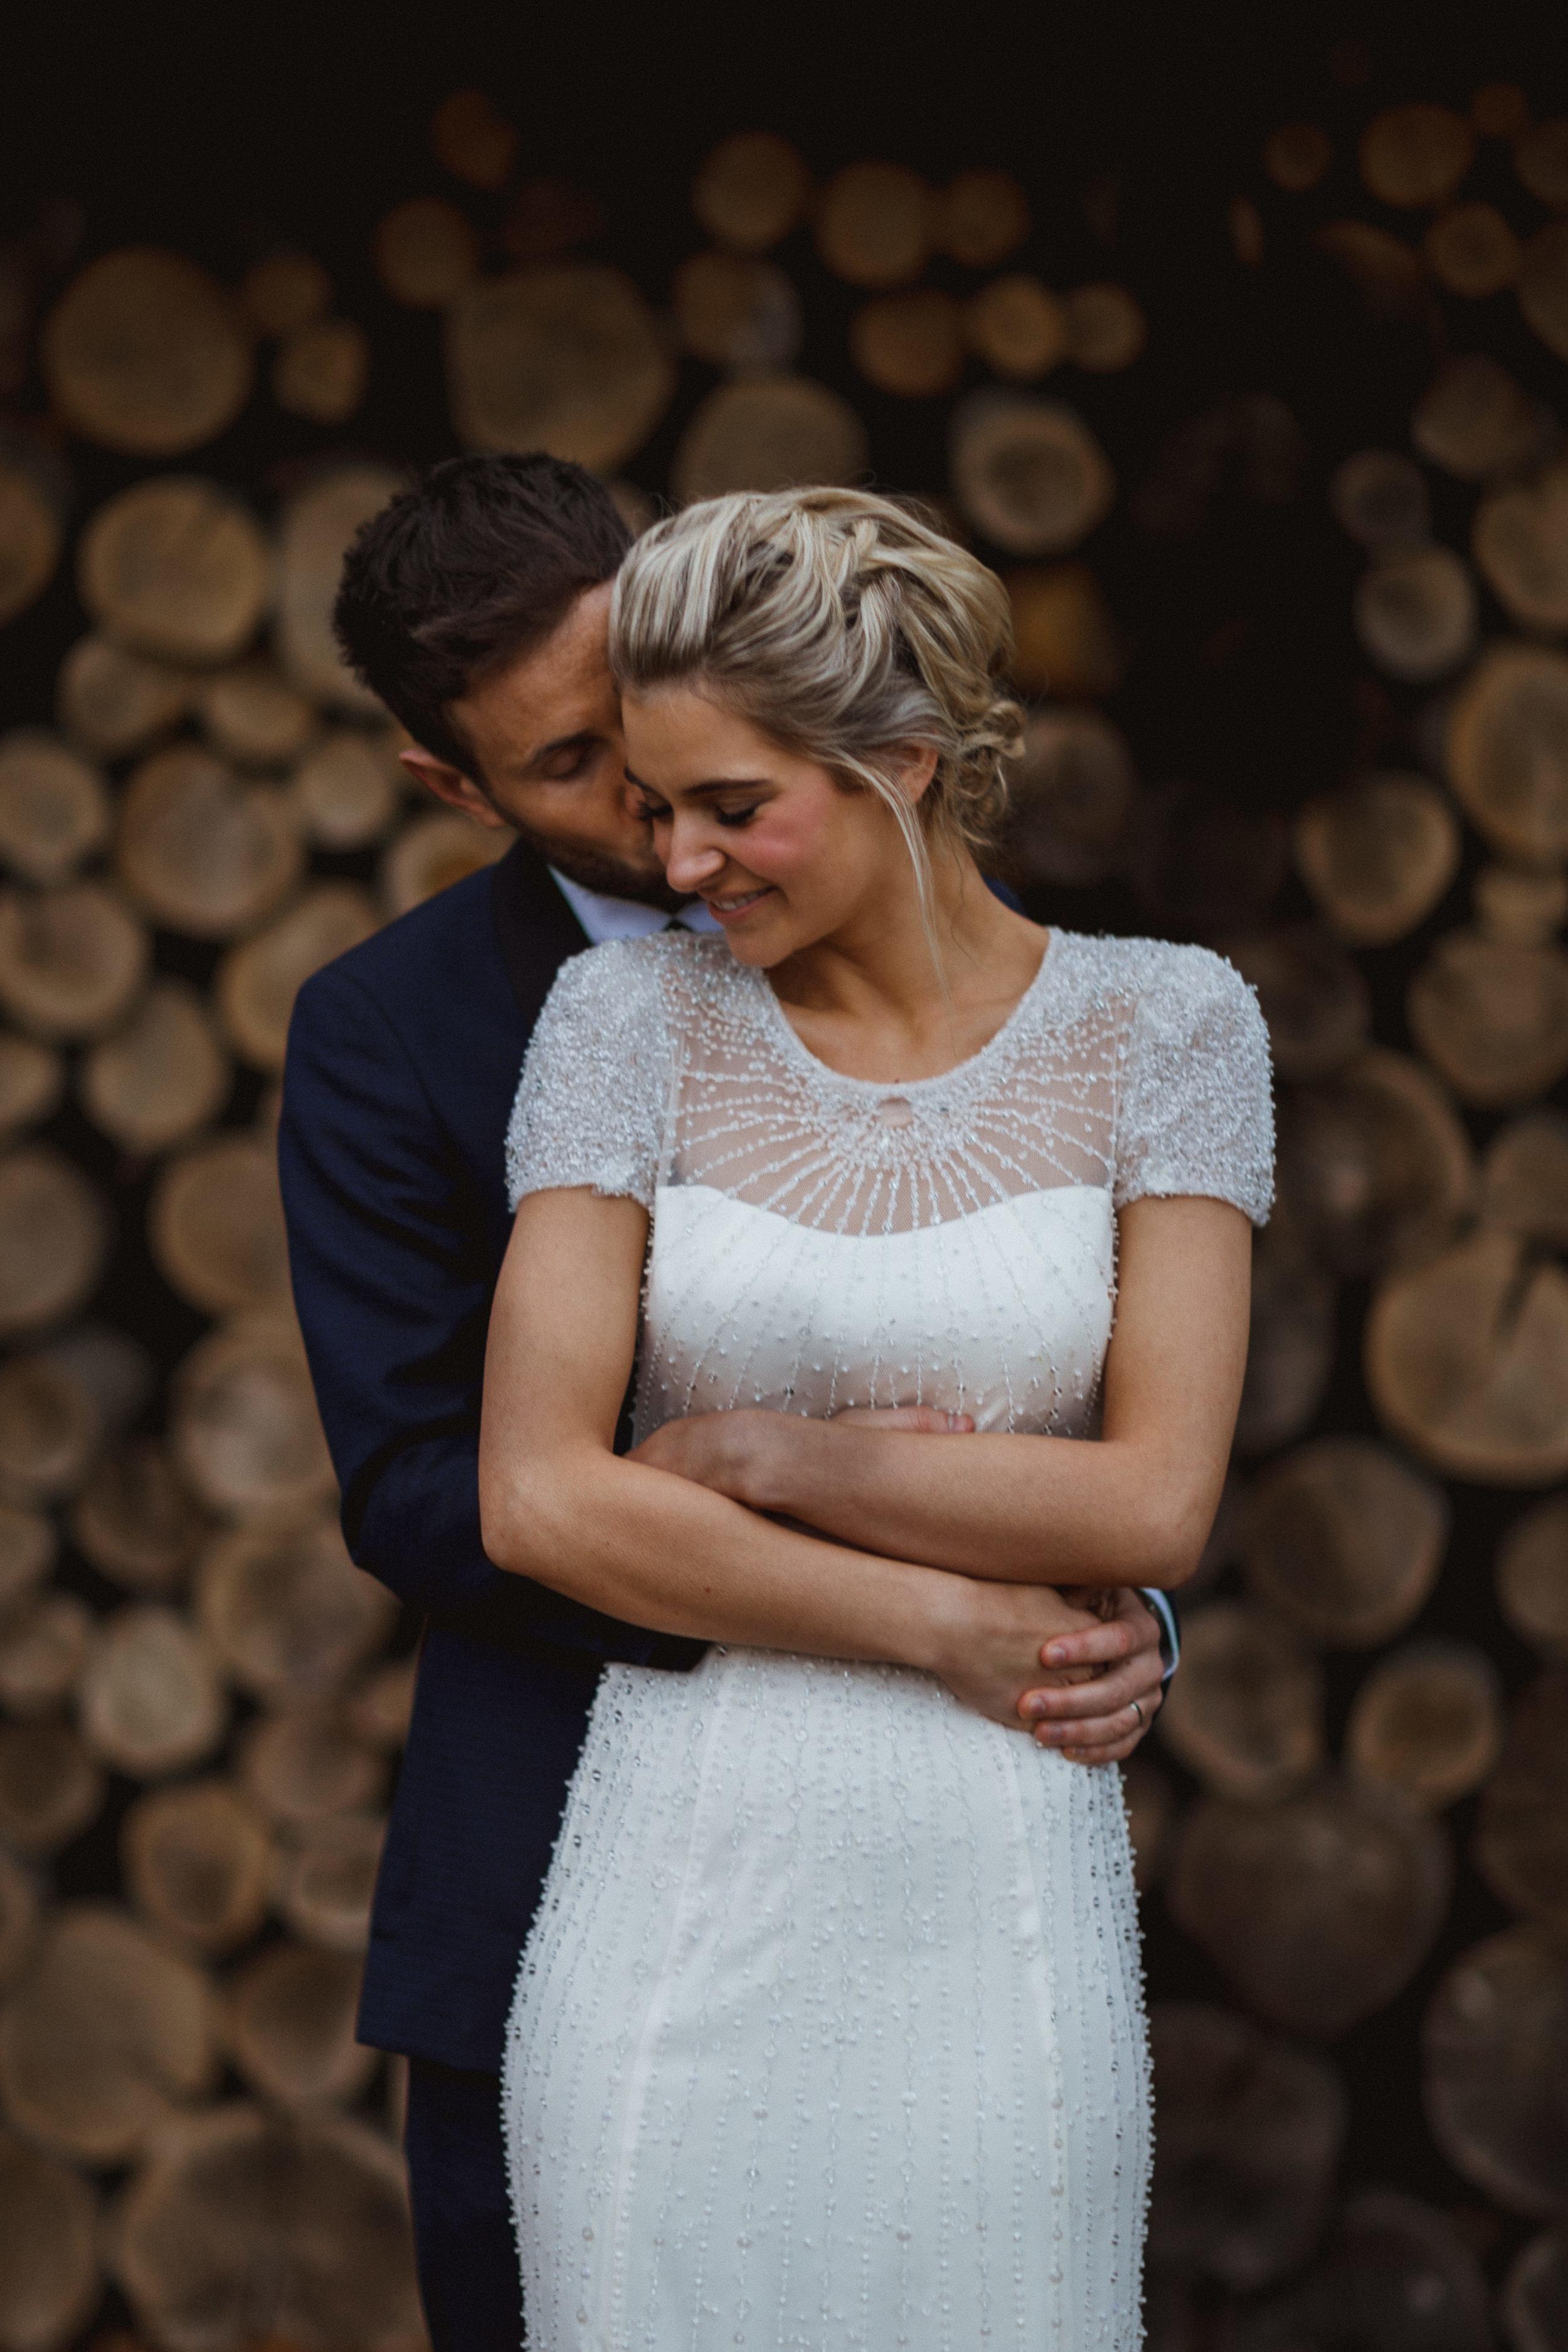 London_wedding_photographer_gione_da_silva_carelle_paul180.jpg